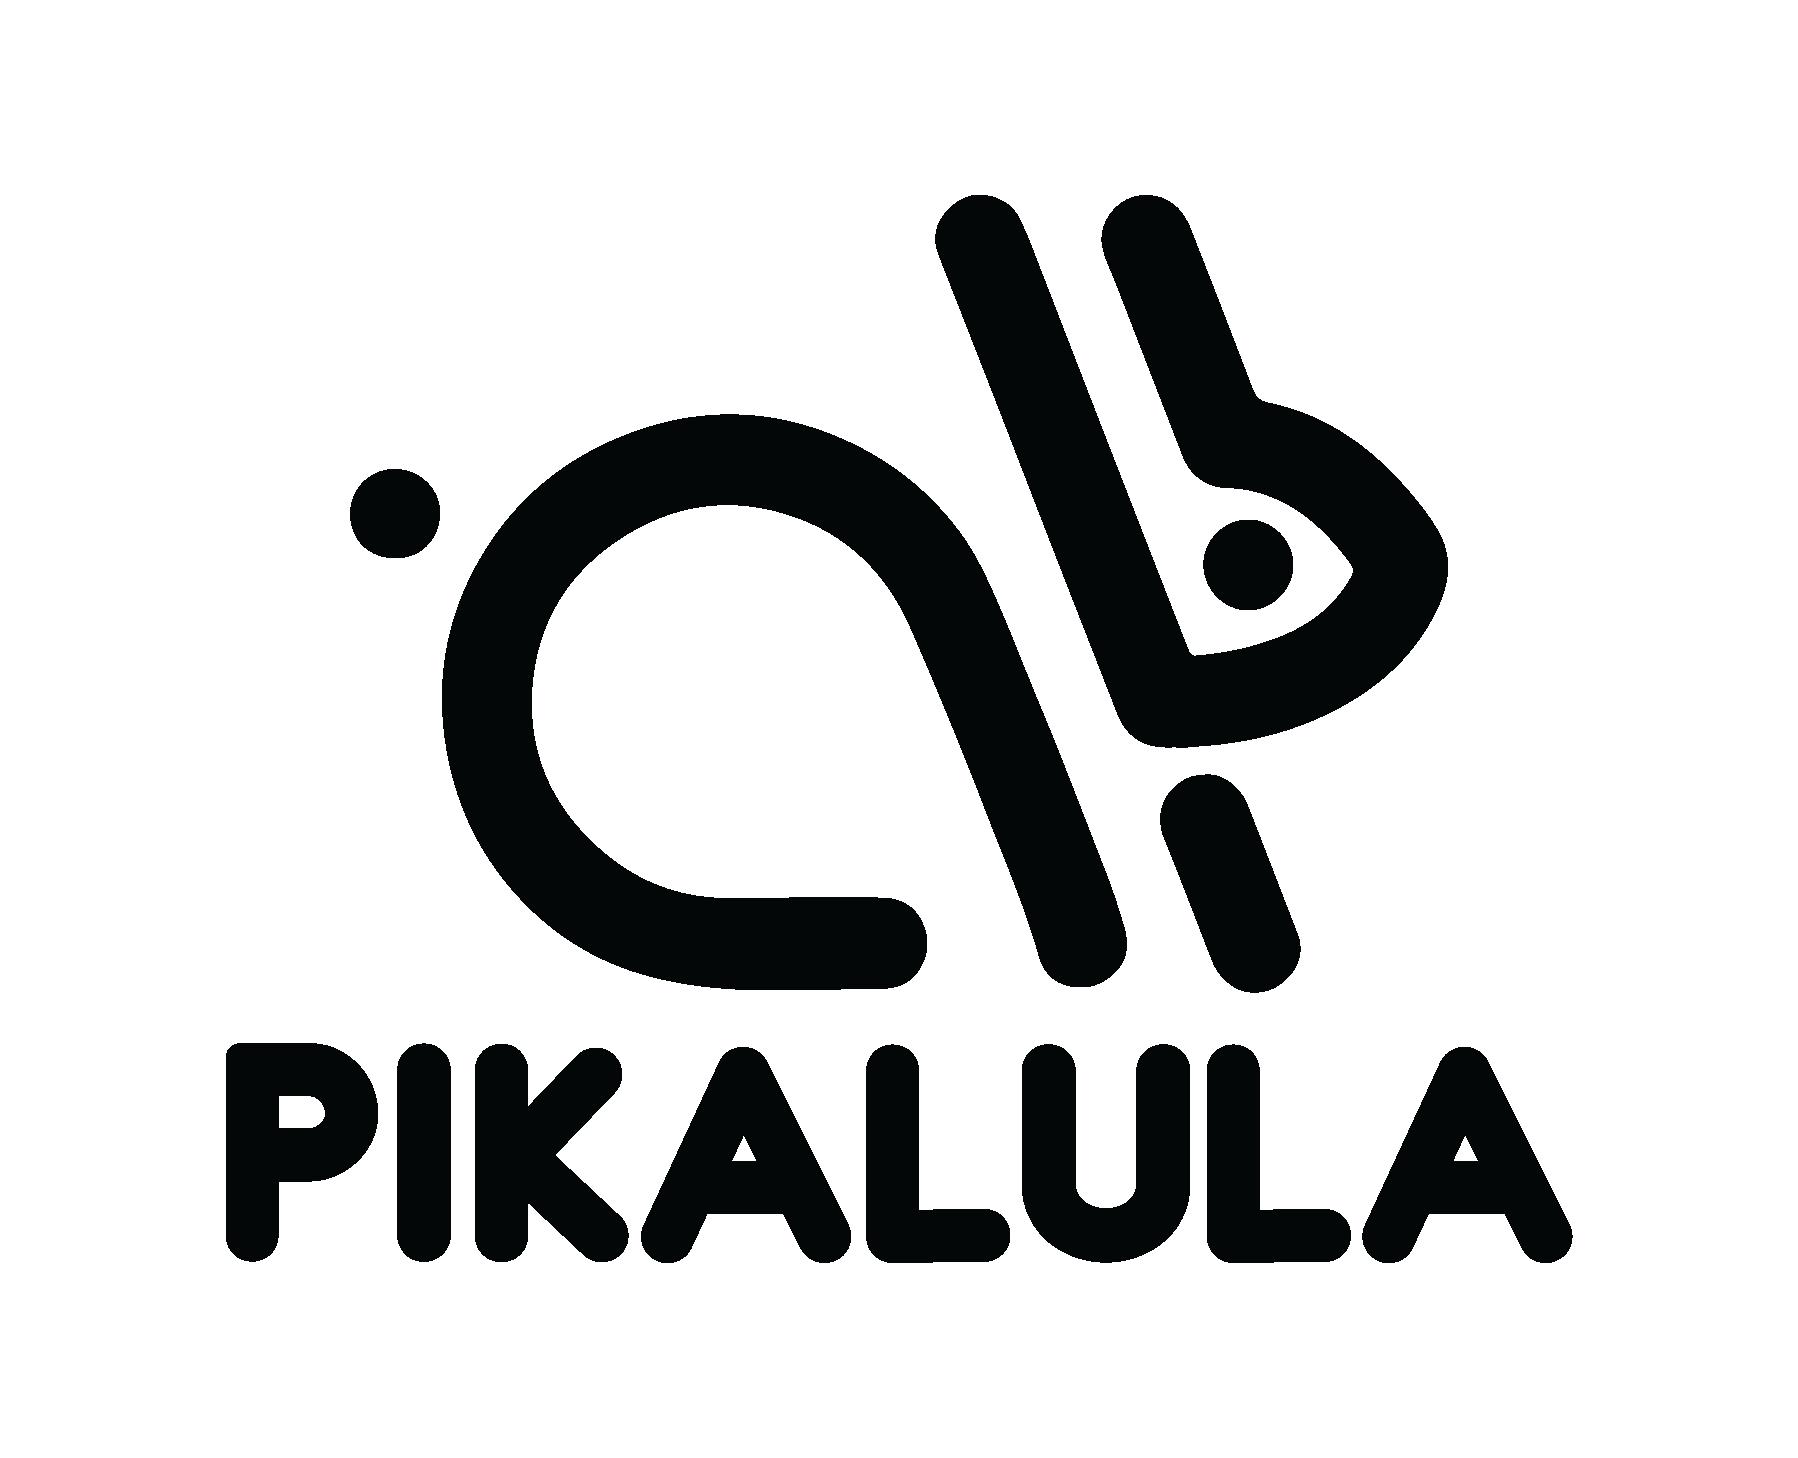 Pikalula